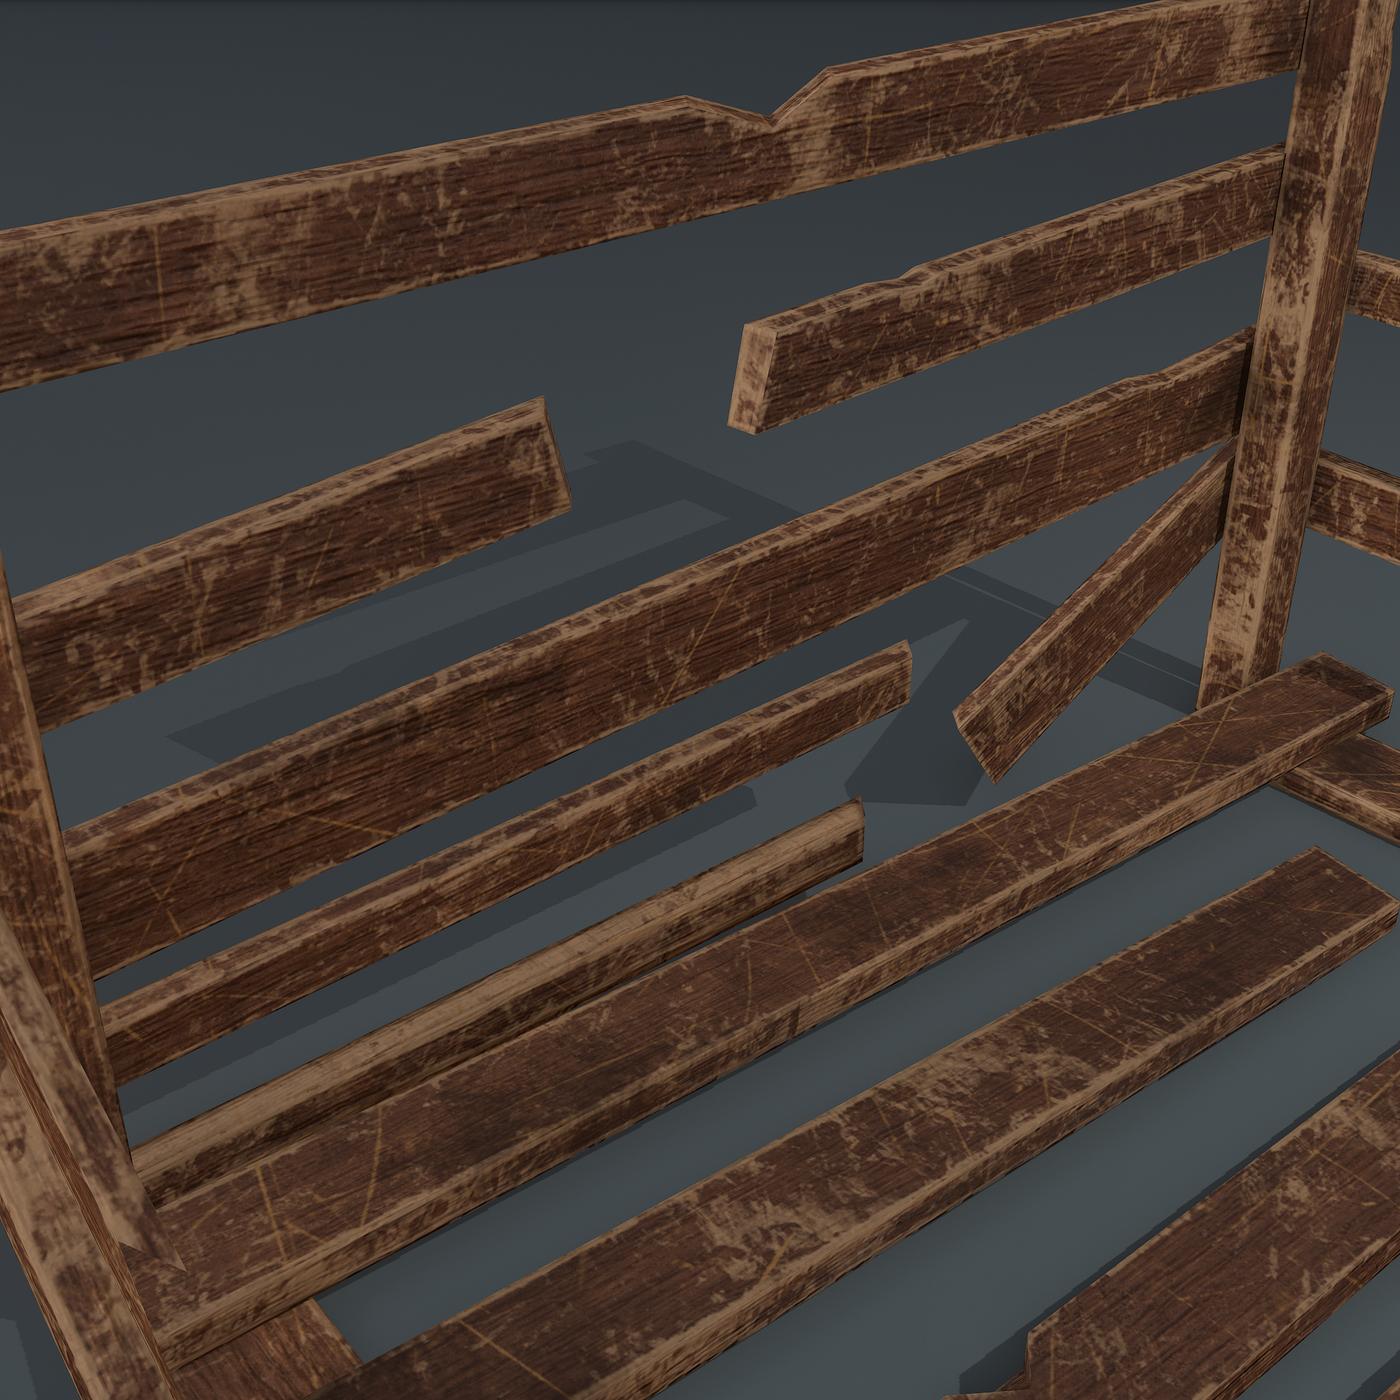 Wood arrangement